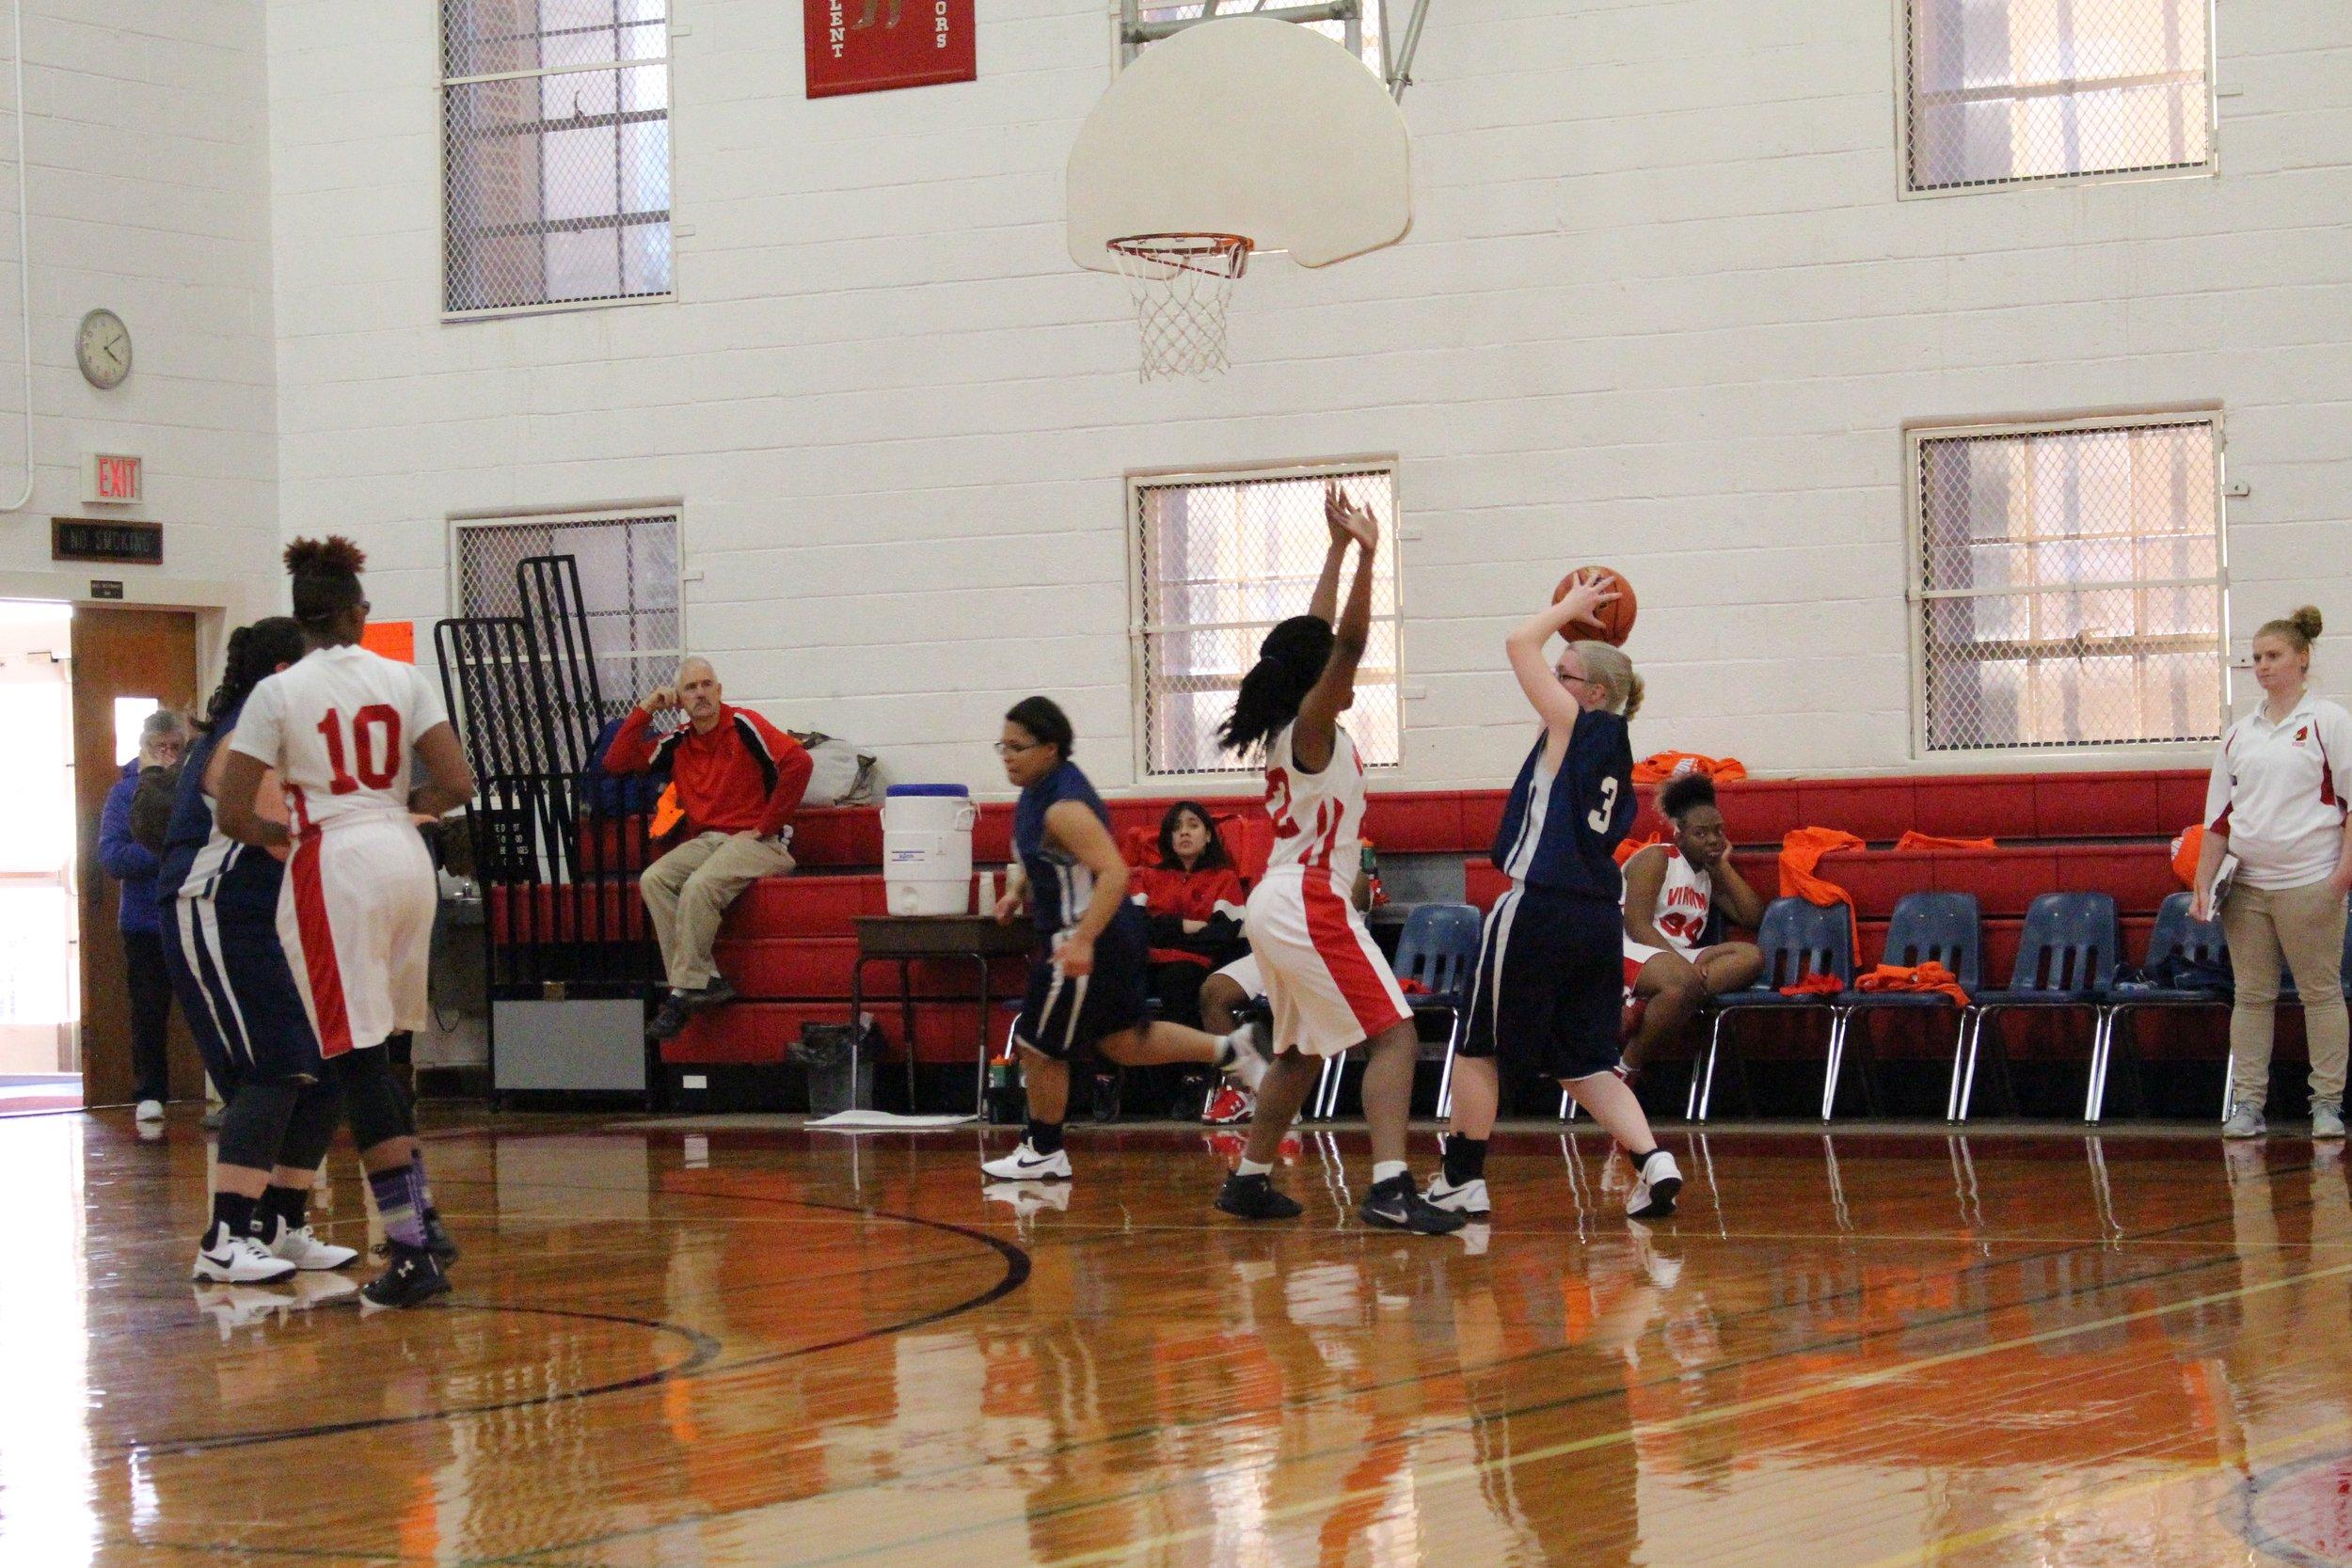 girls basketball in play.jpg